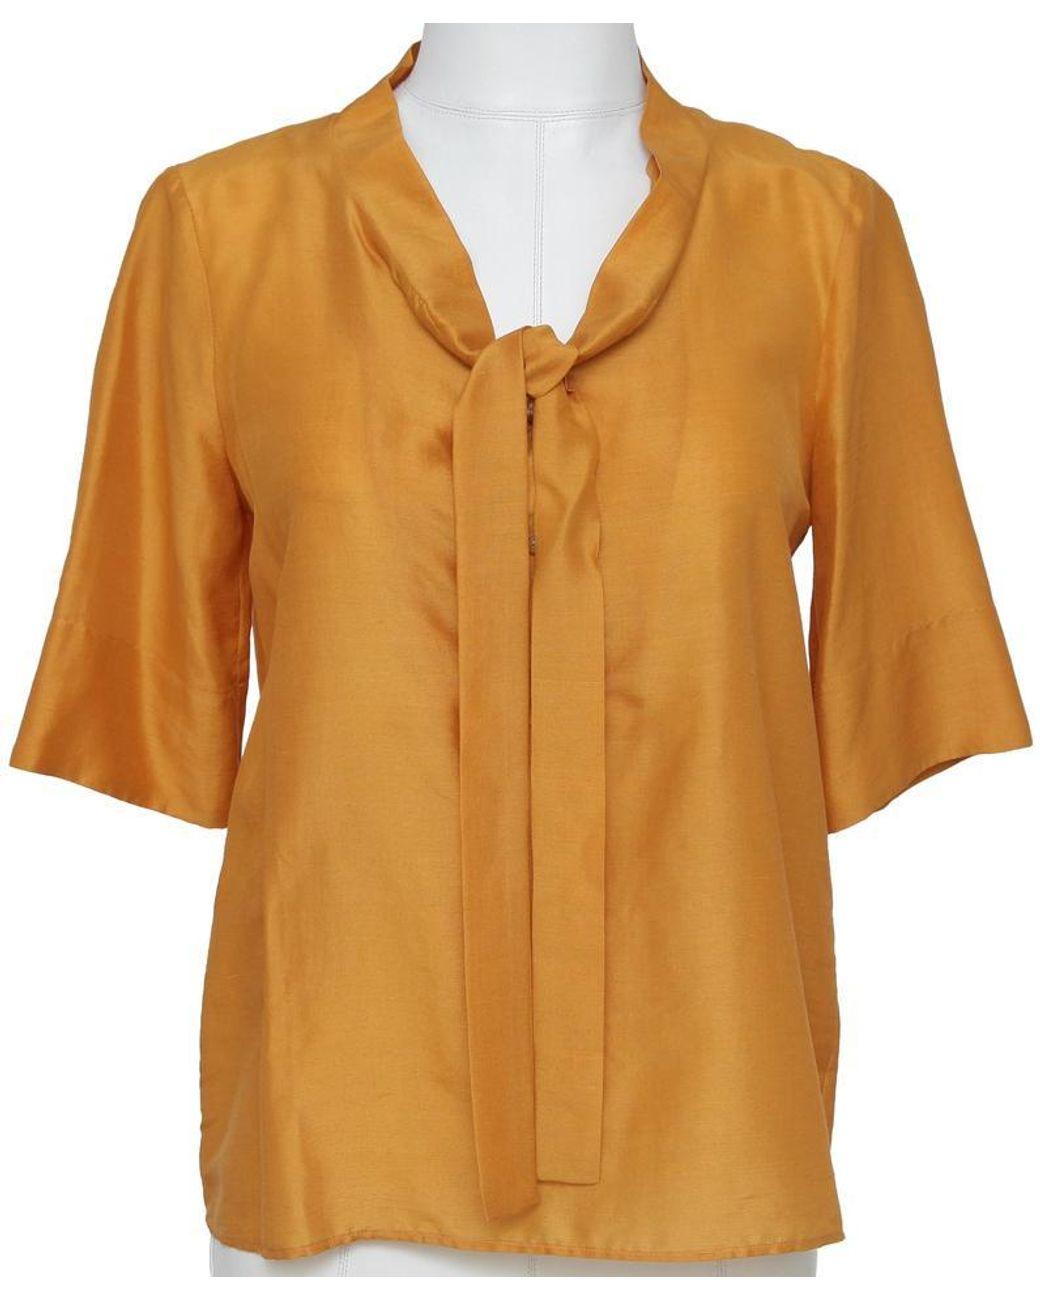 NWT ST JOHN Knits Silk Georgette Split Sleeve Tassel Blouse Shirt Top sz S $495